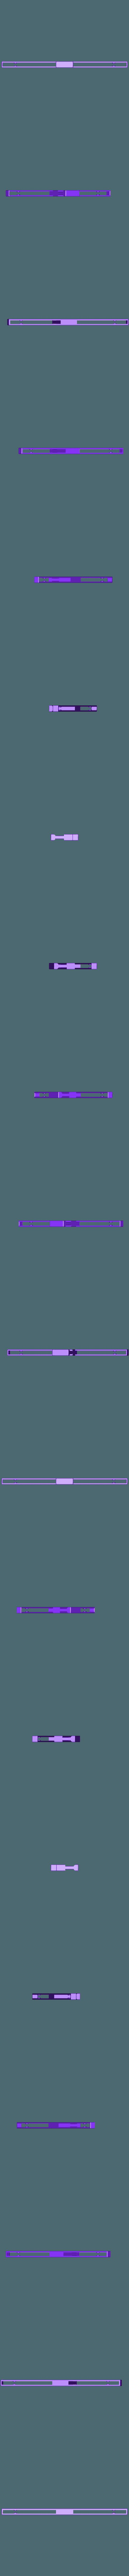 Bottom Rail.stl Download free STL file Primitive Wood Chopper Toy • 3D print object, WW3D